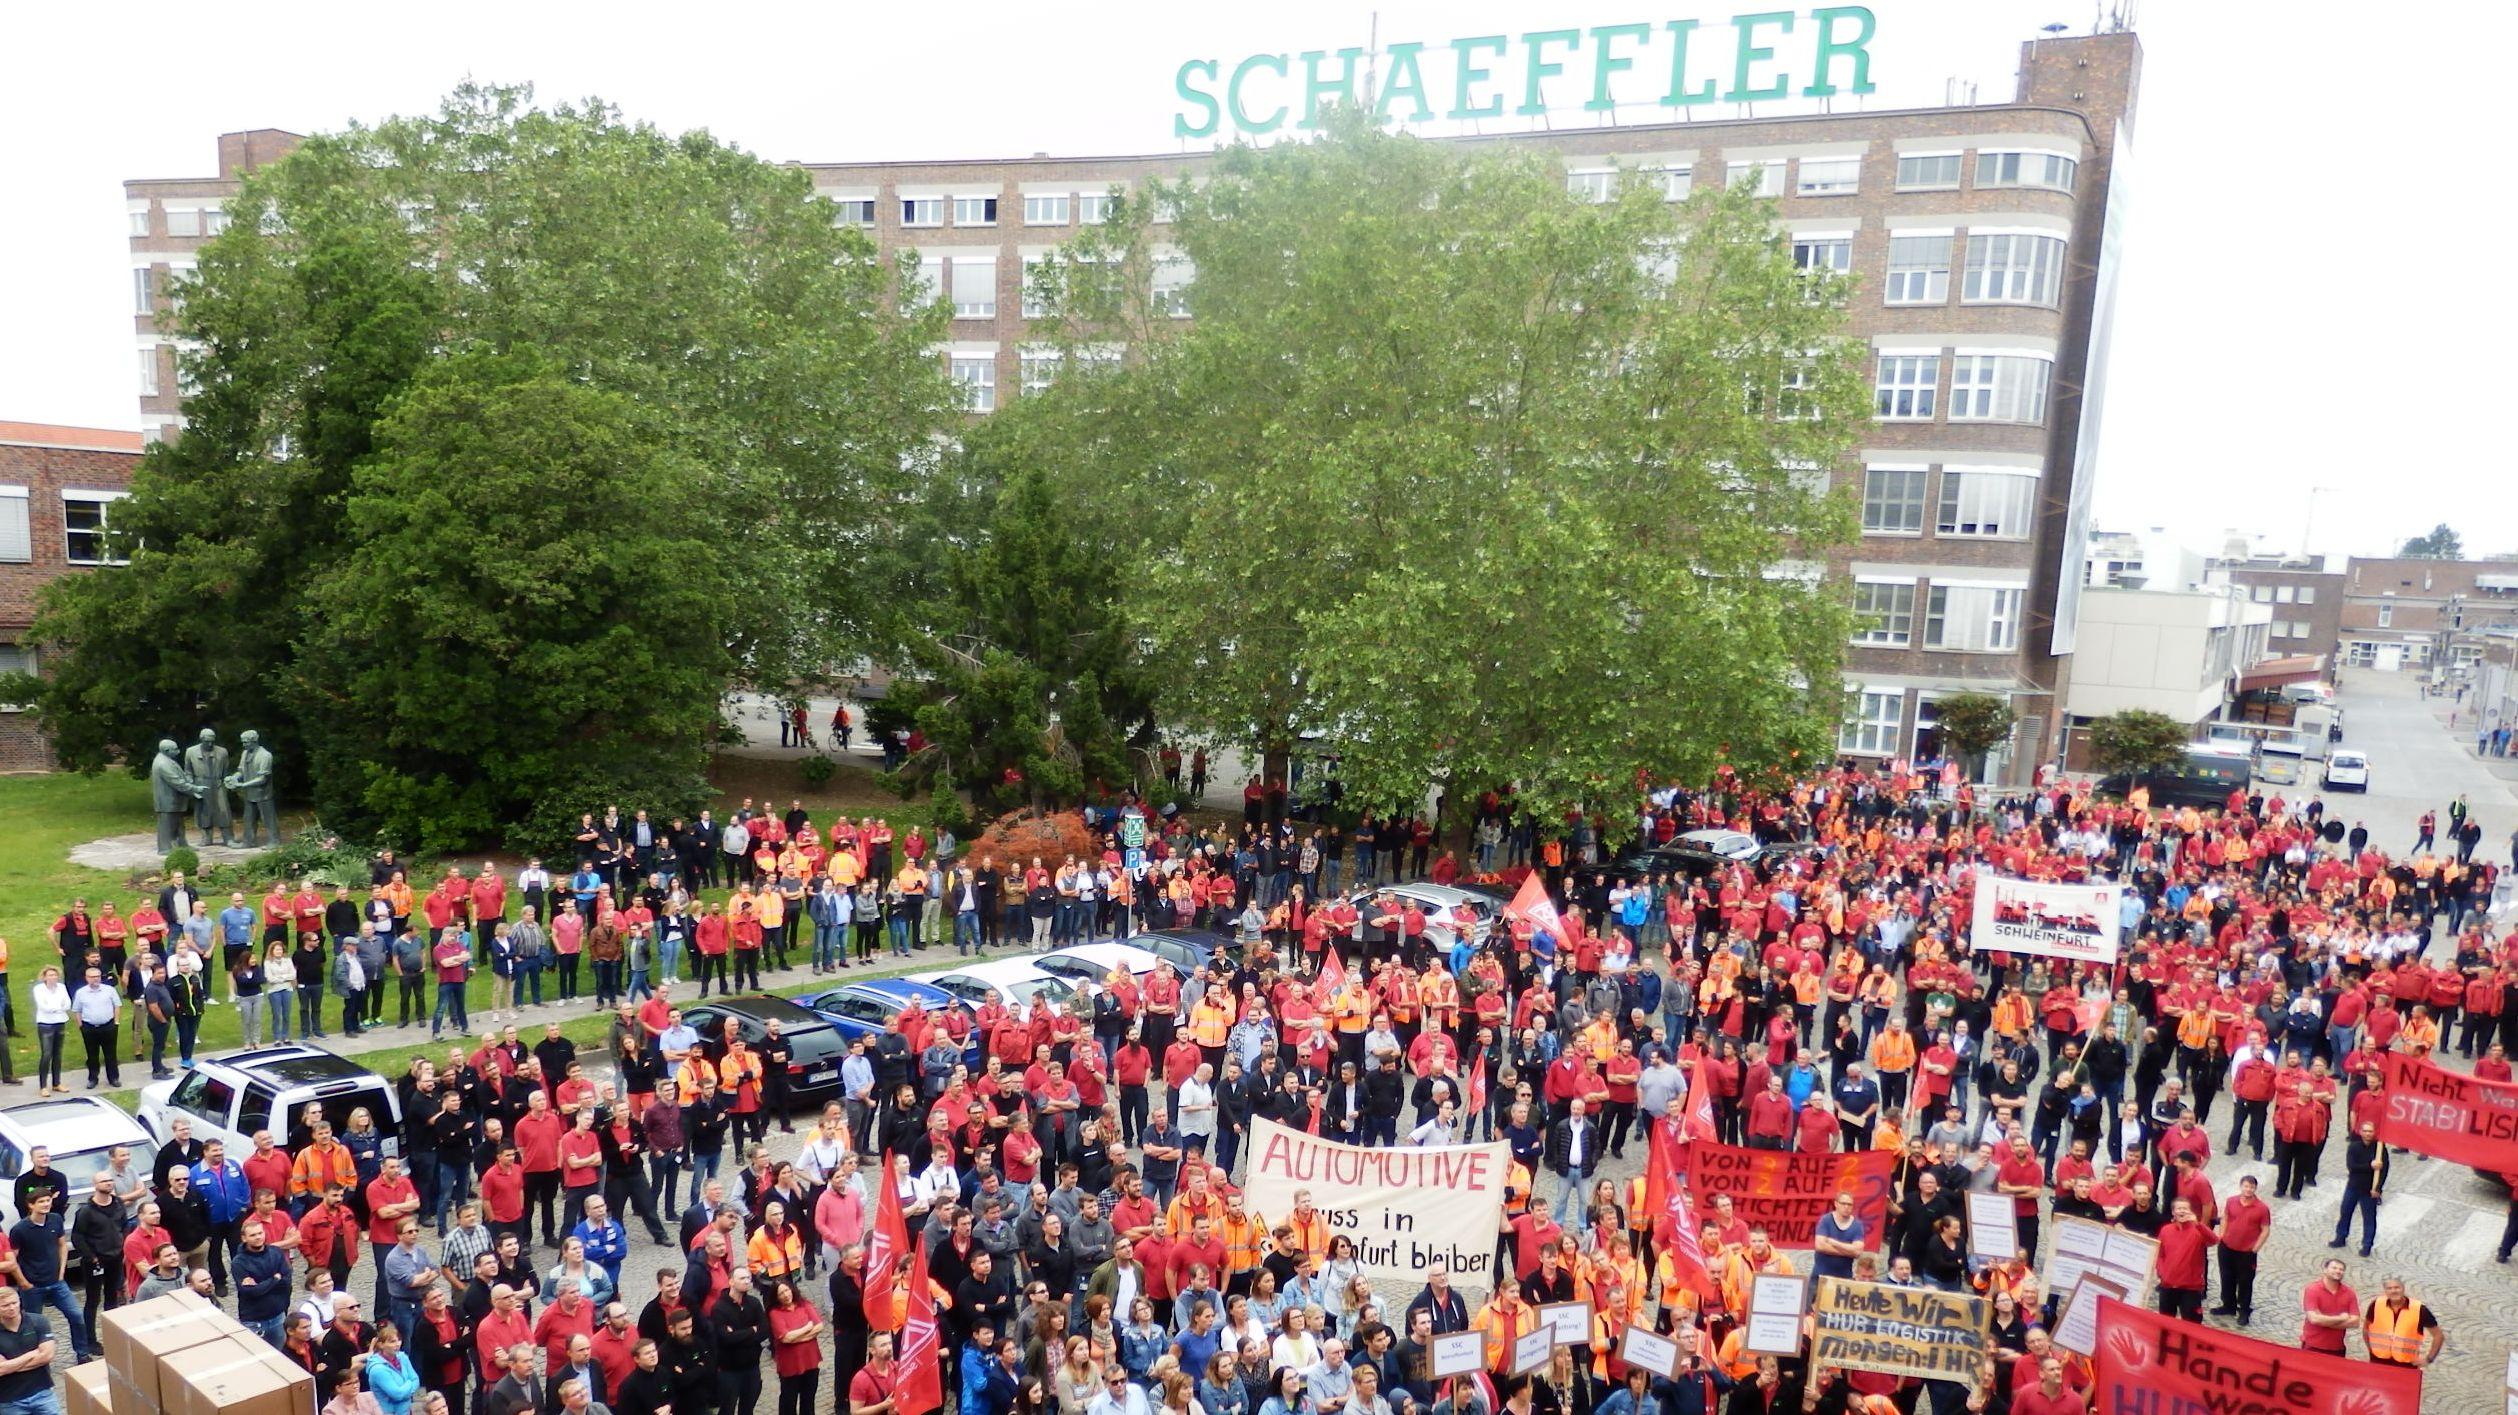 Mitarbeiter protestieren vor dem Schaeffler-Standort in Schweinfurt